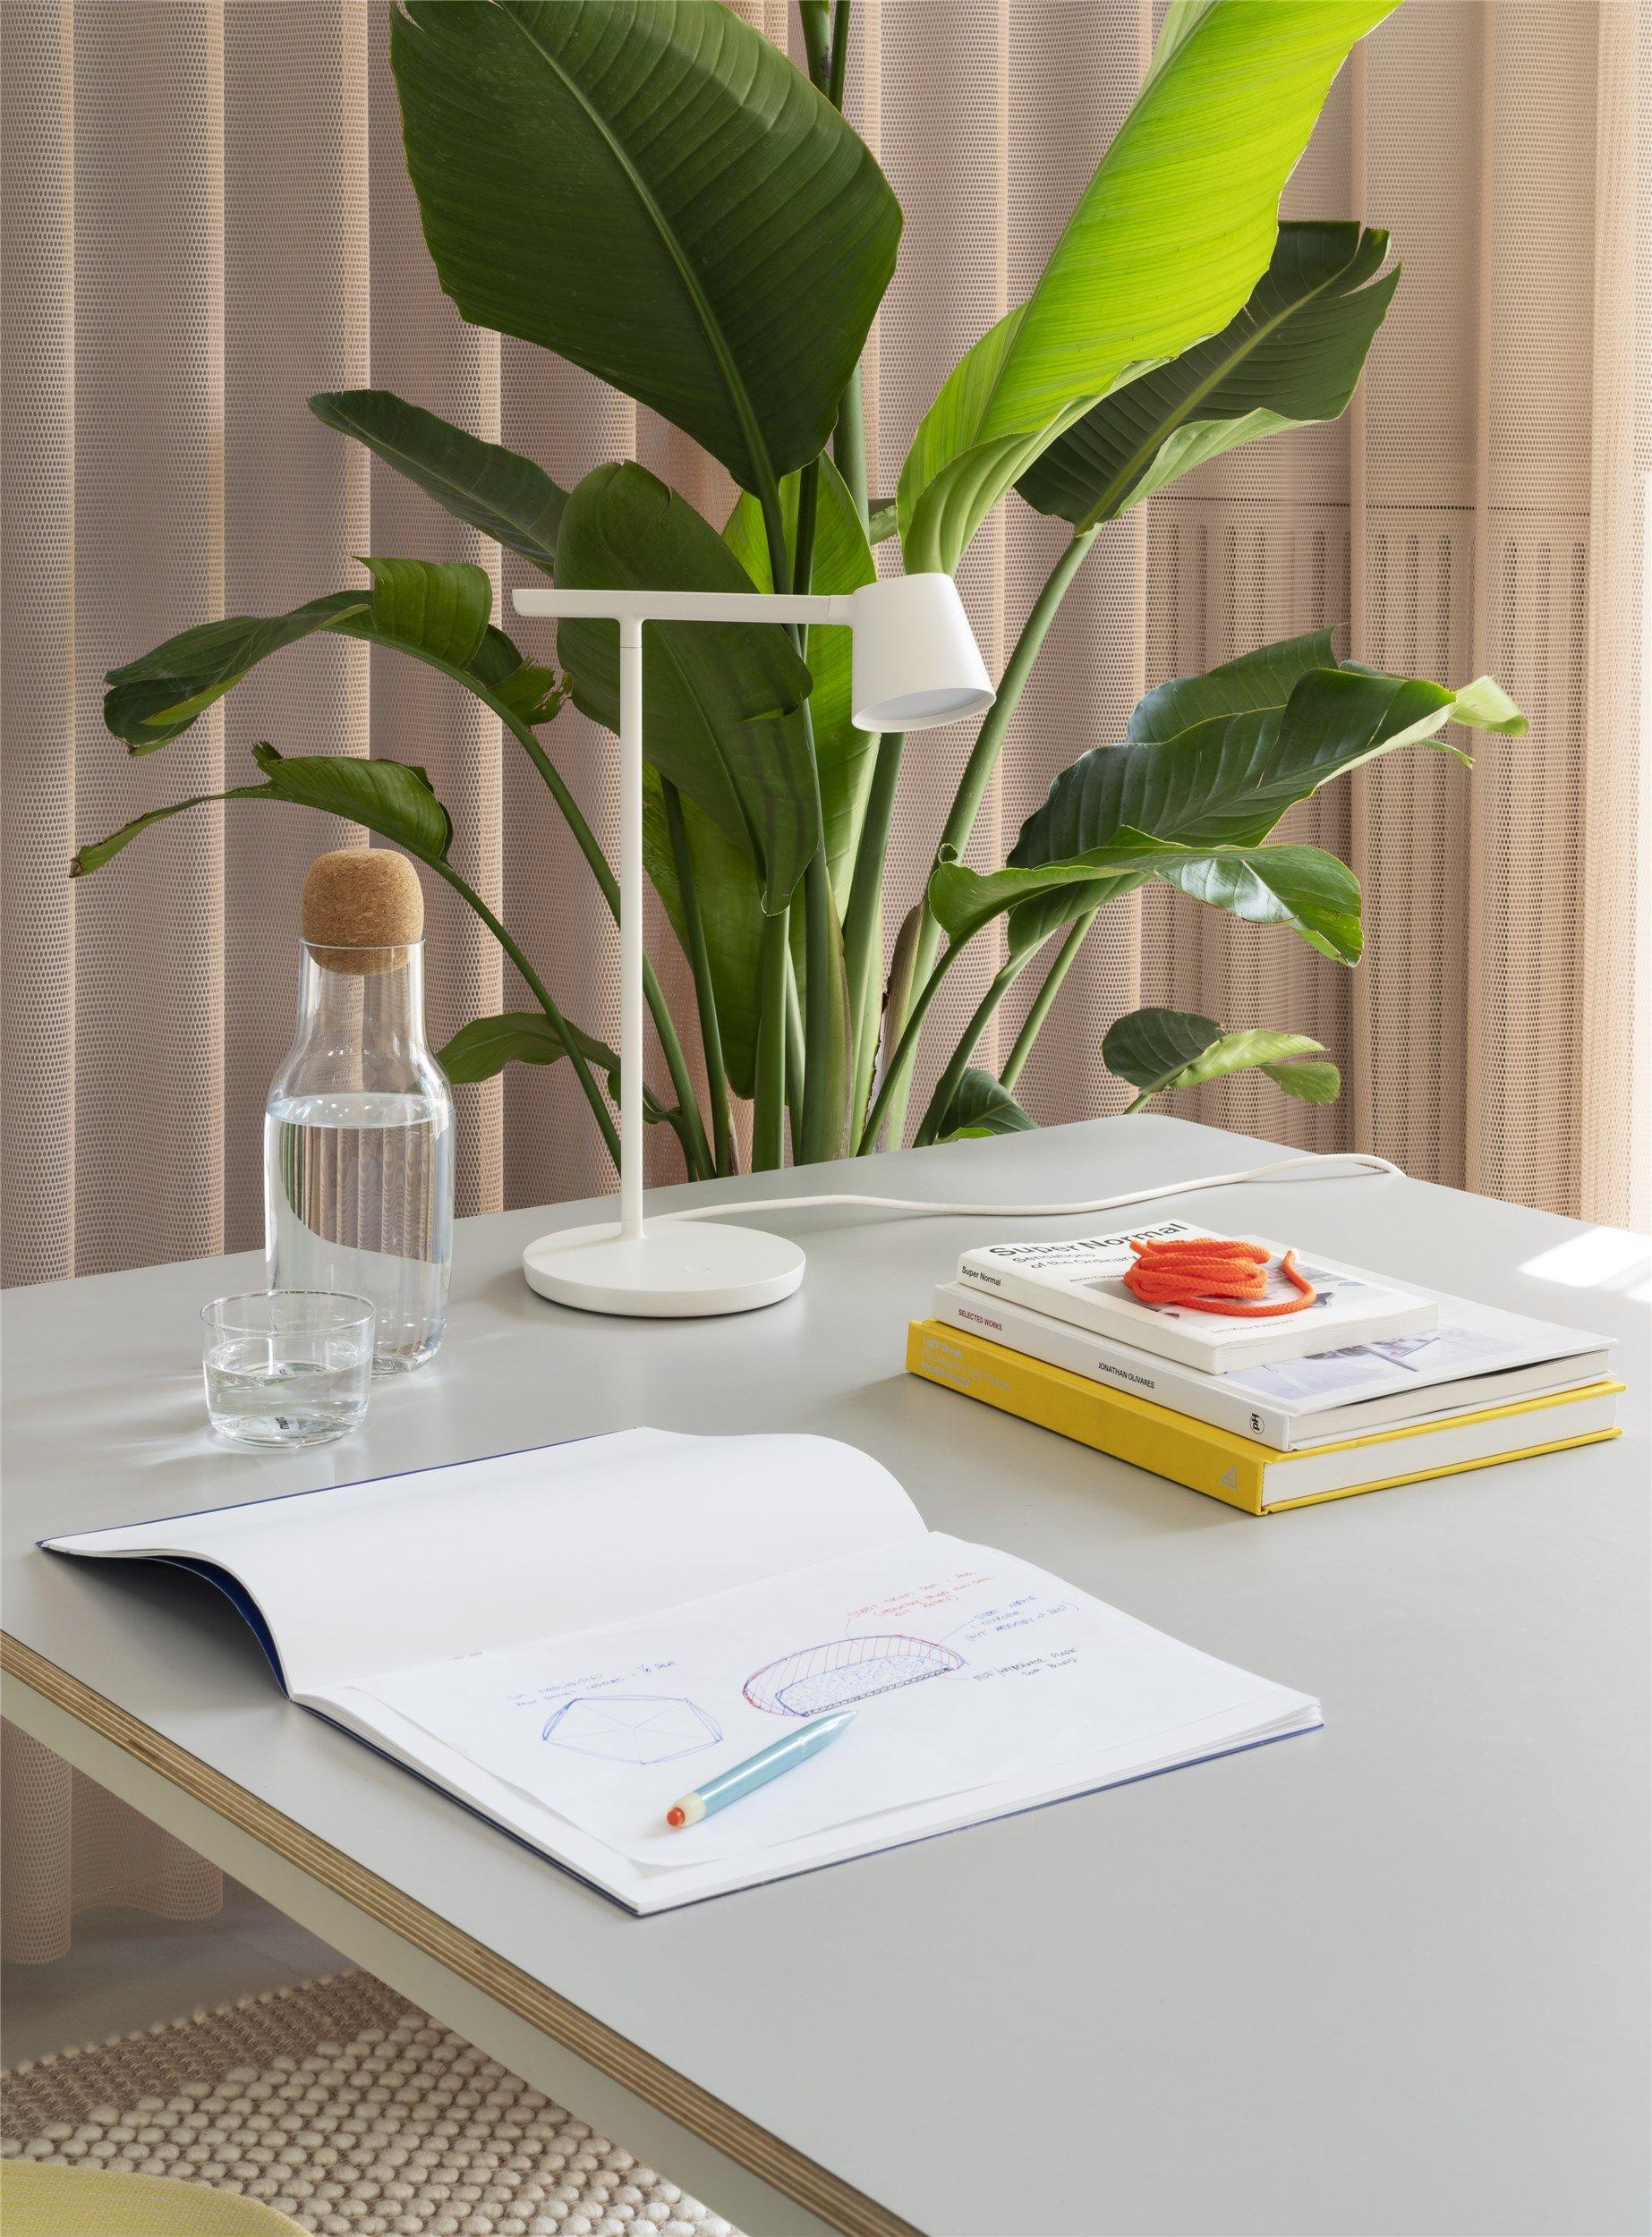 Tip Table Lamp In 2020 Table Lamp Muuto Lamp